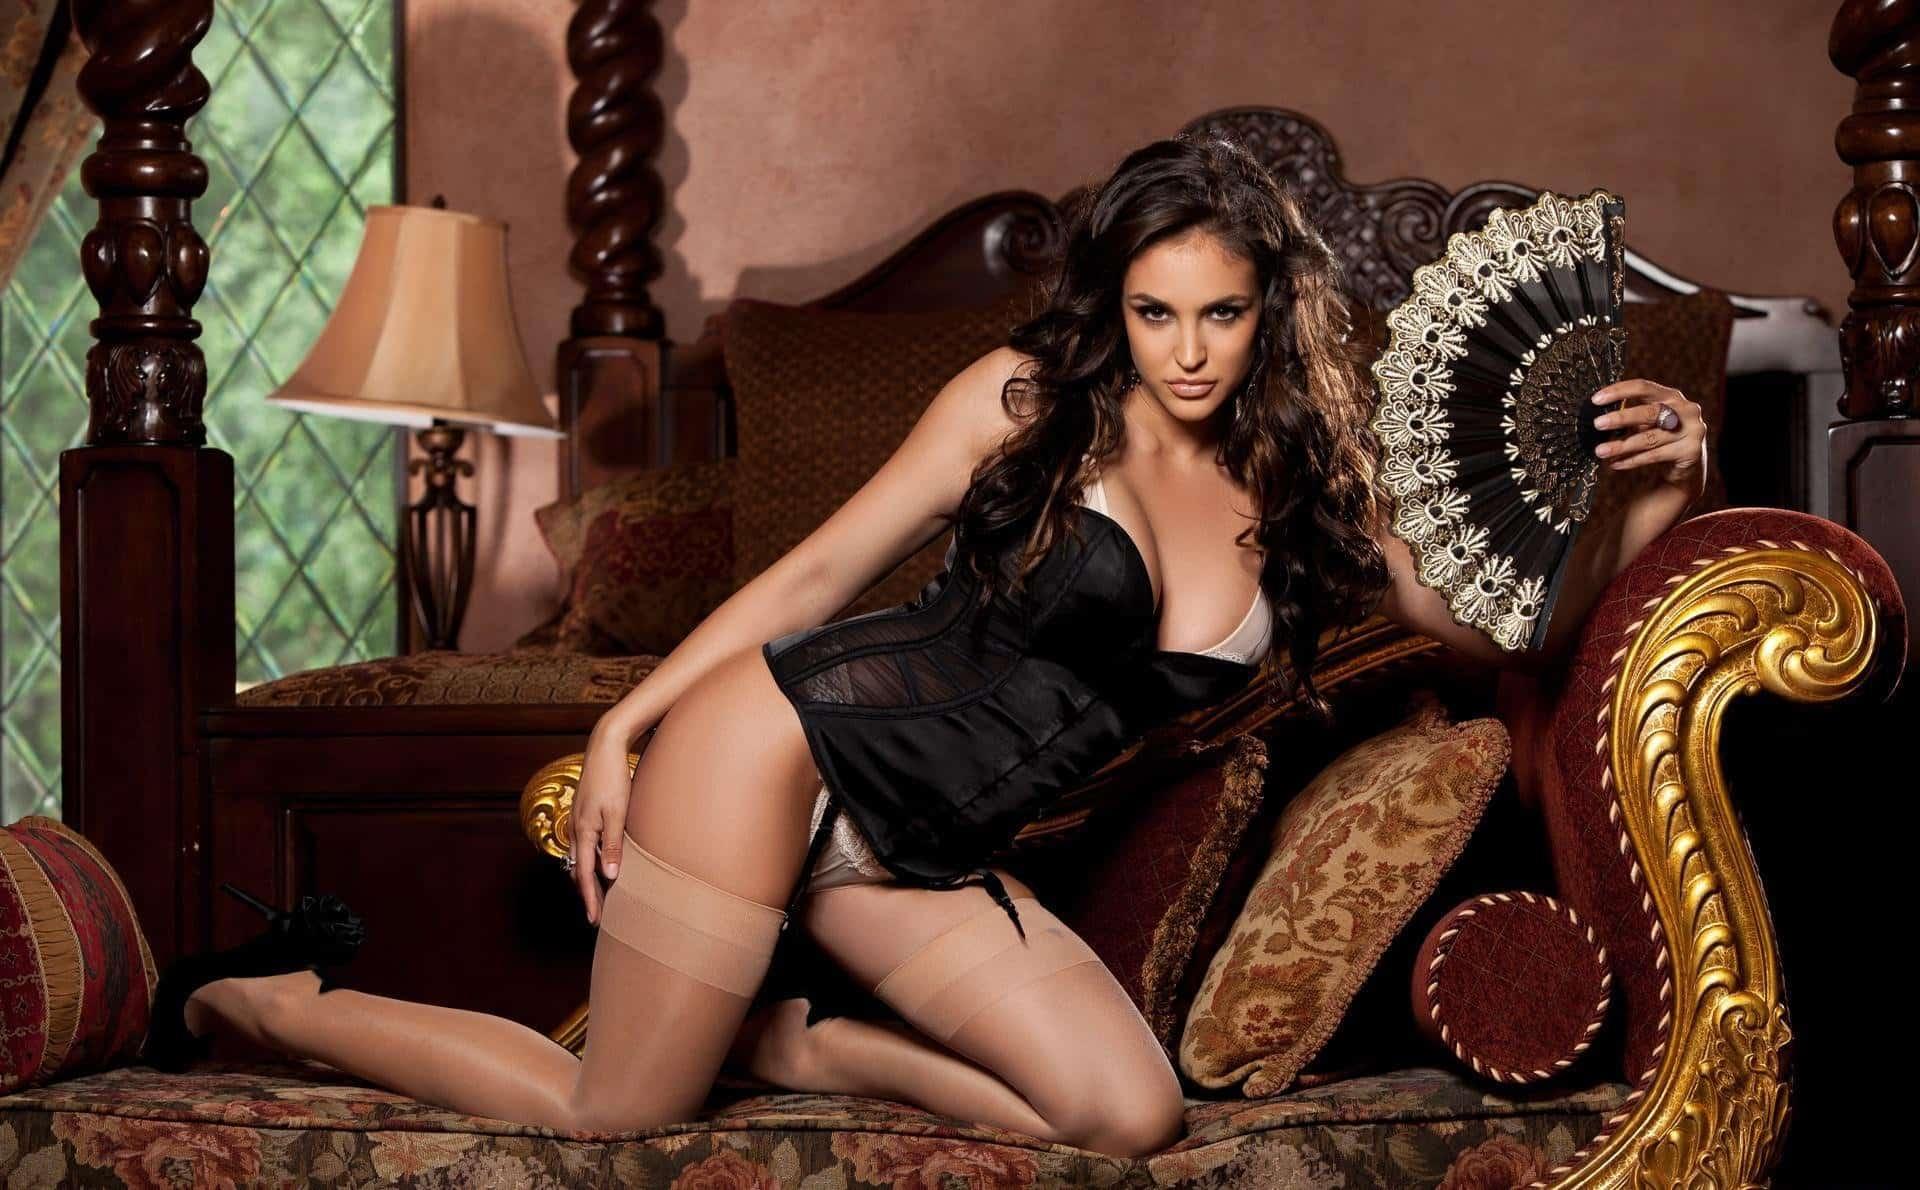 sexy undertøy dame sexleketøy butikk